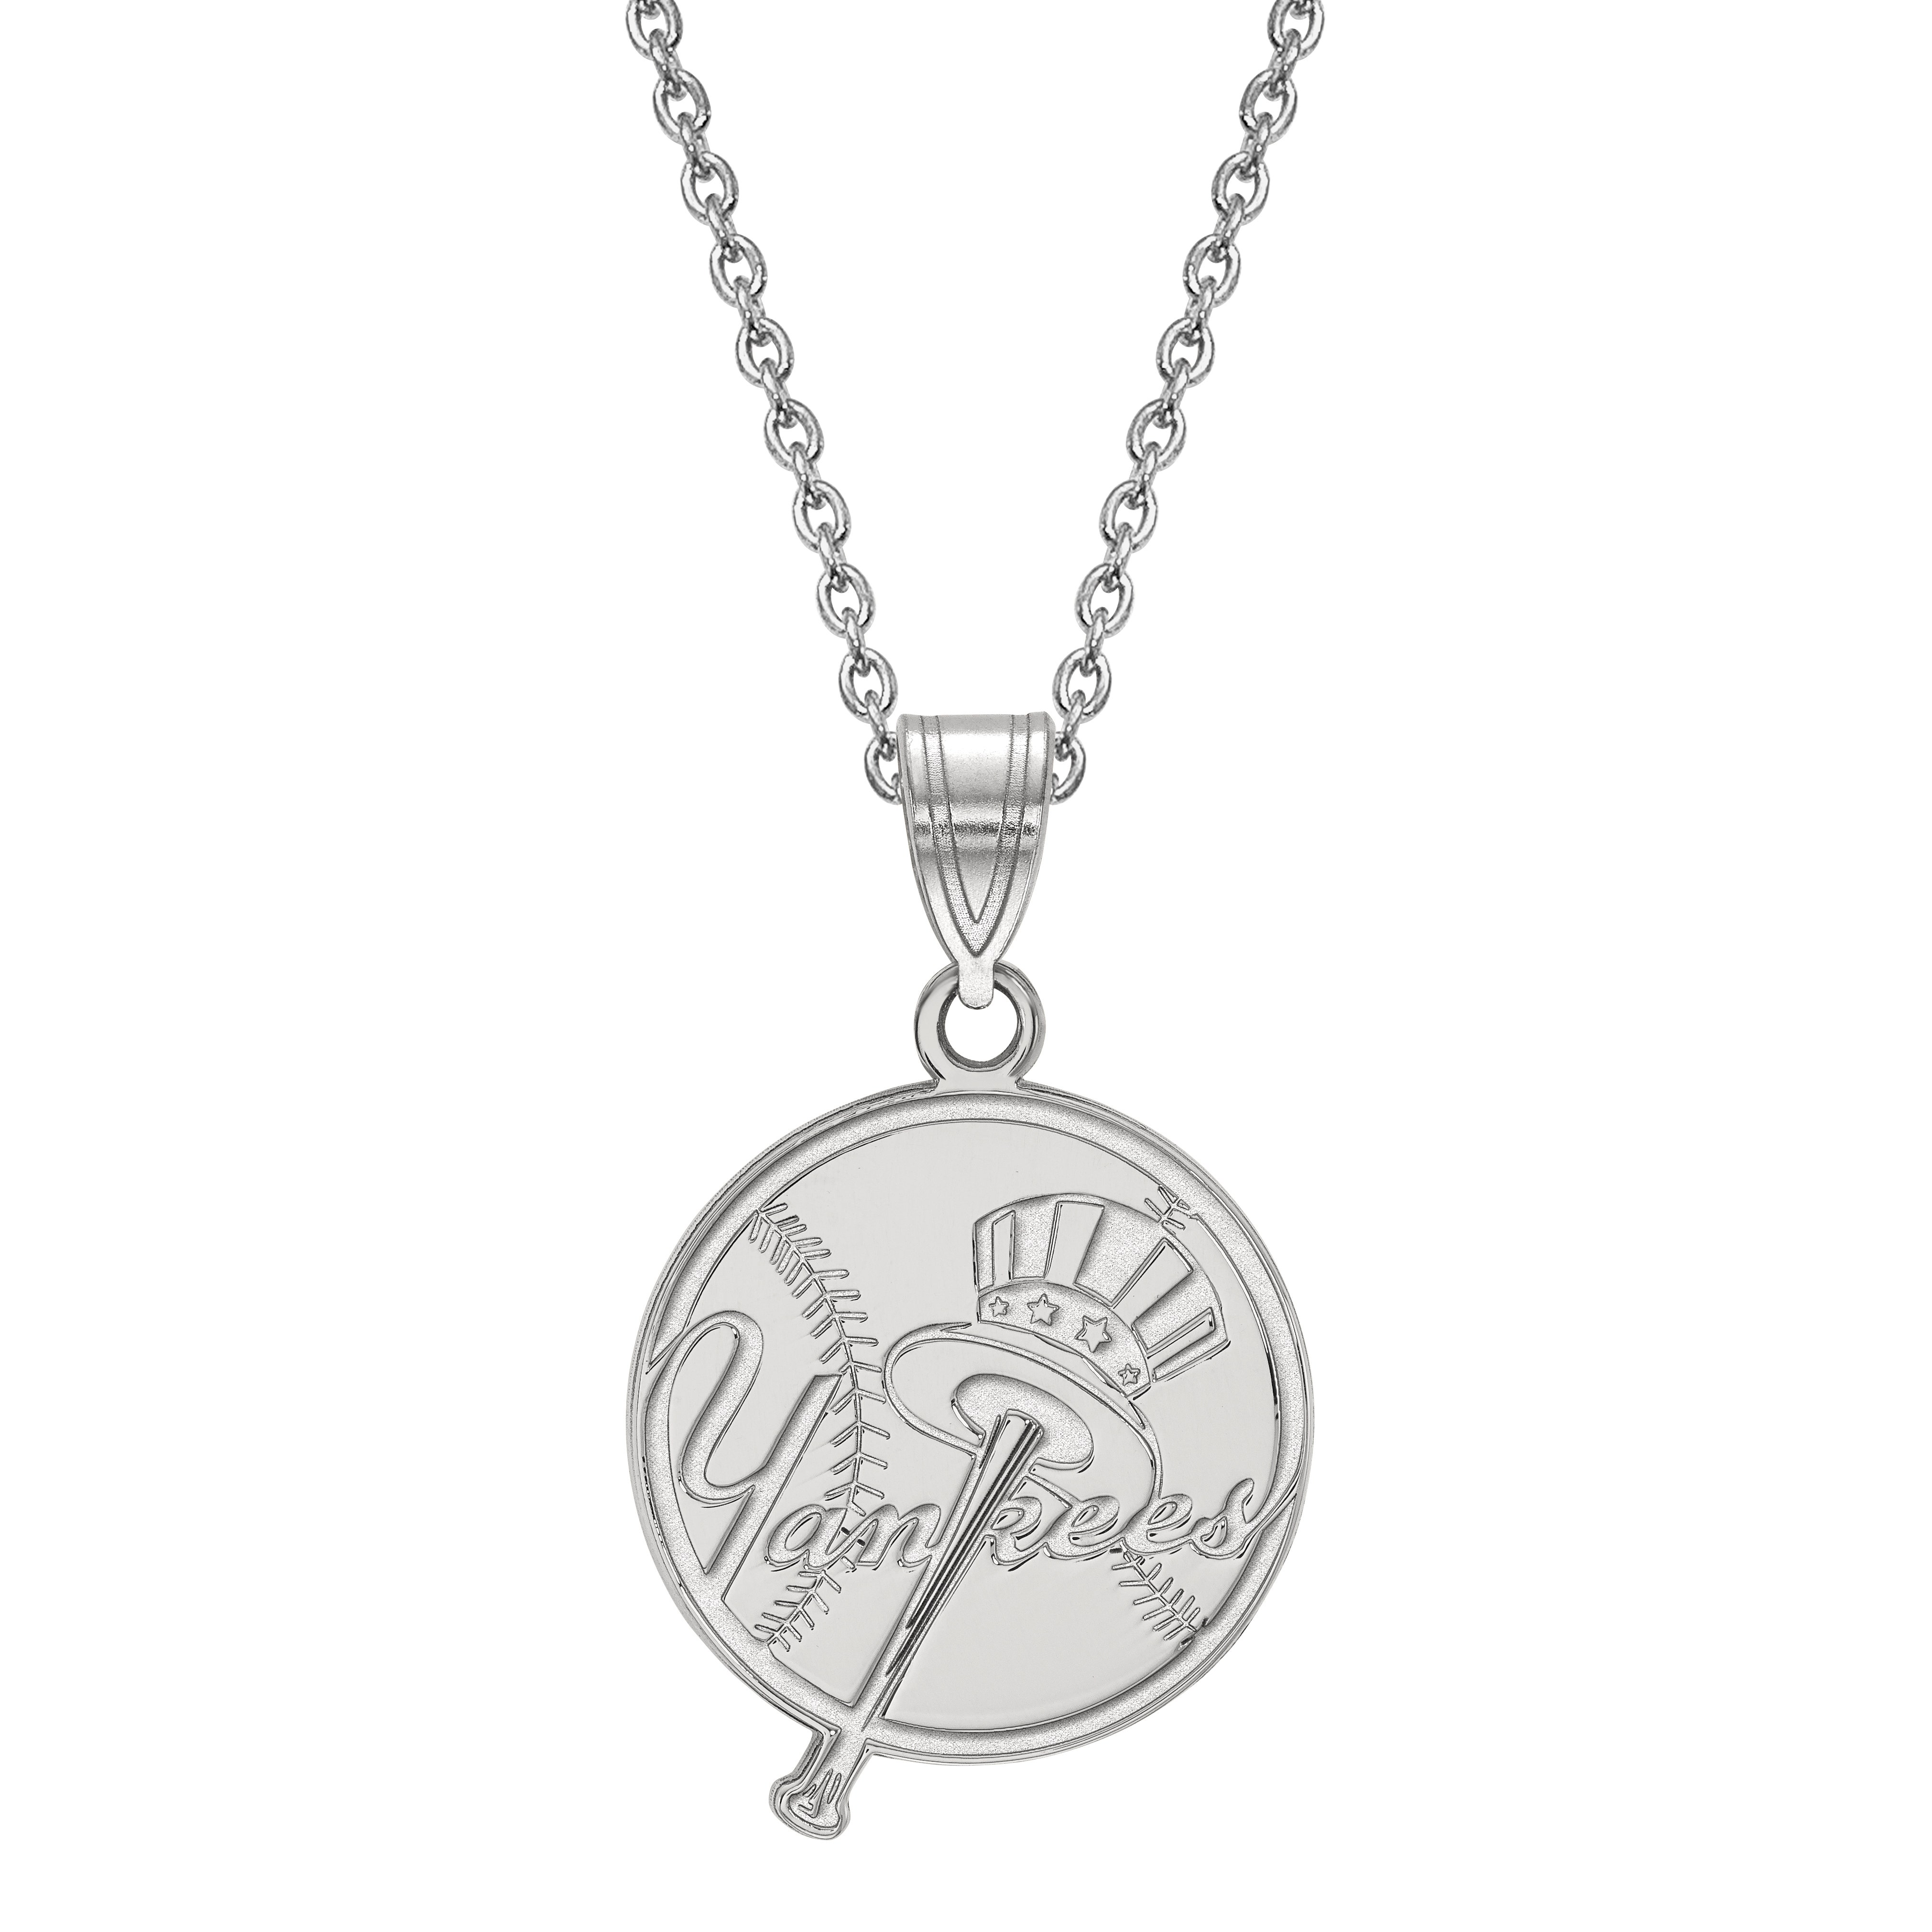 Sterling silver New York pendant